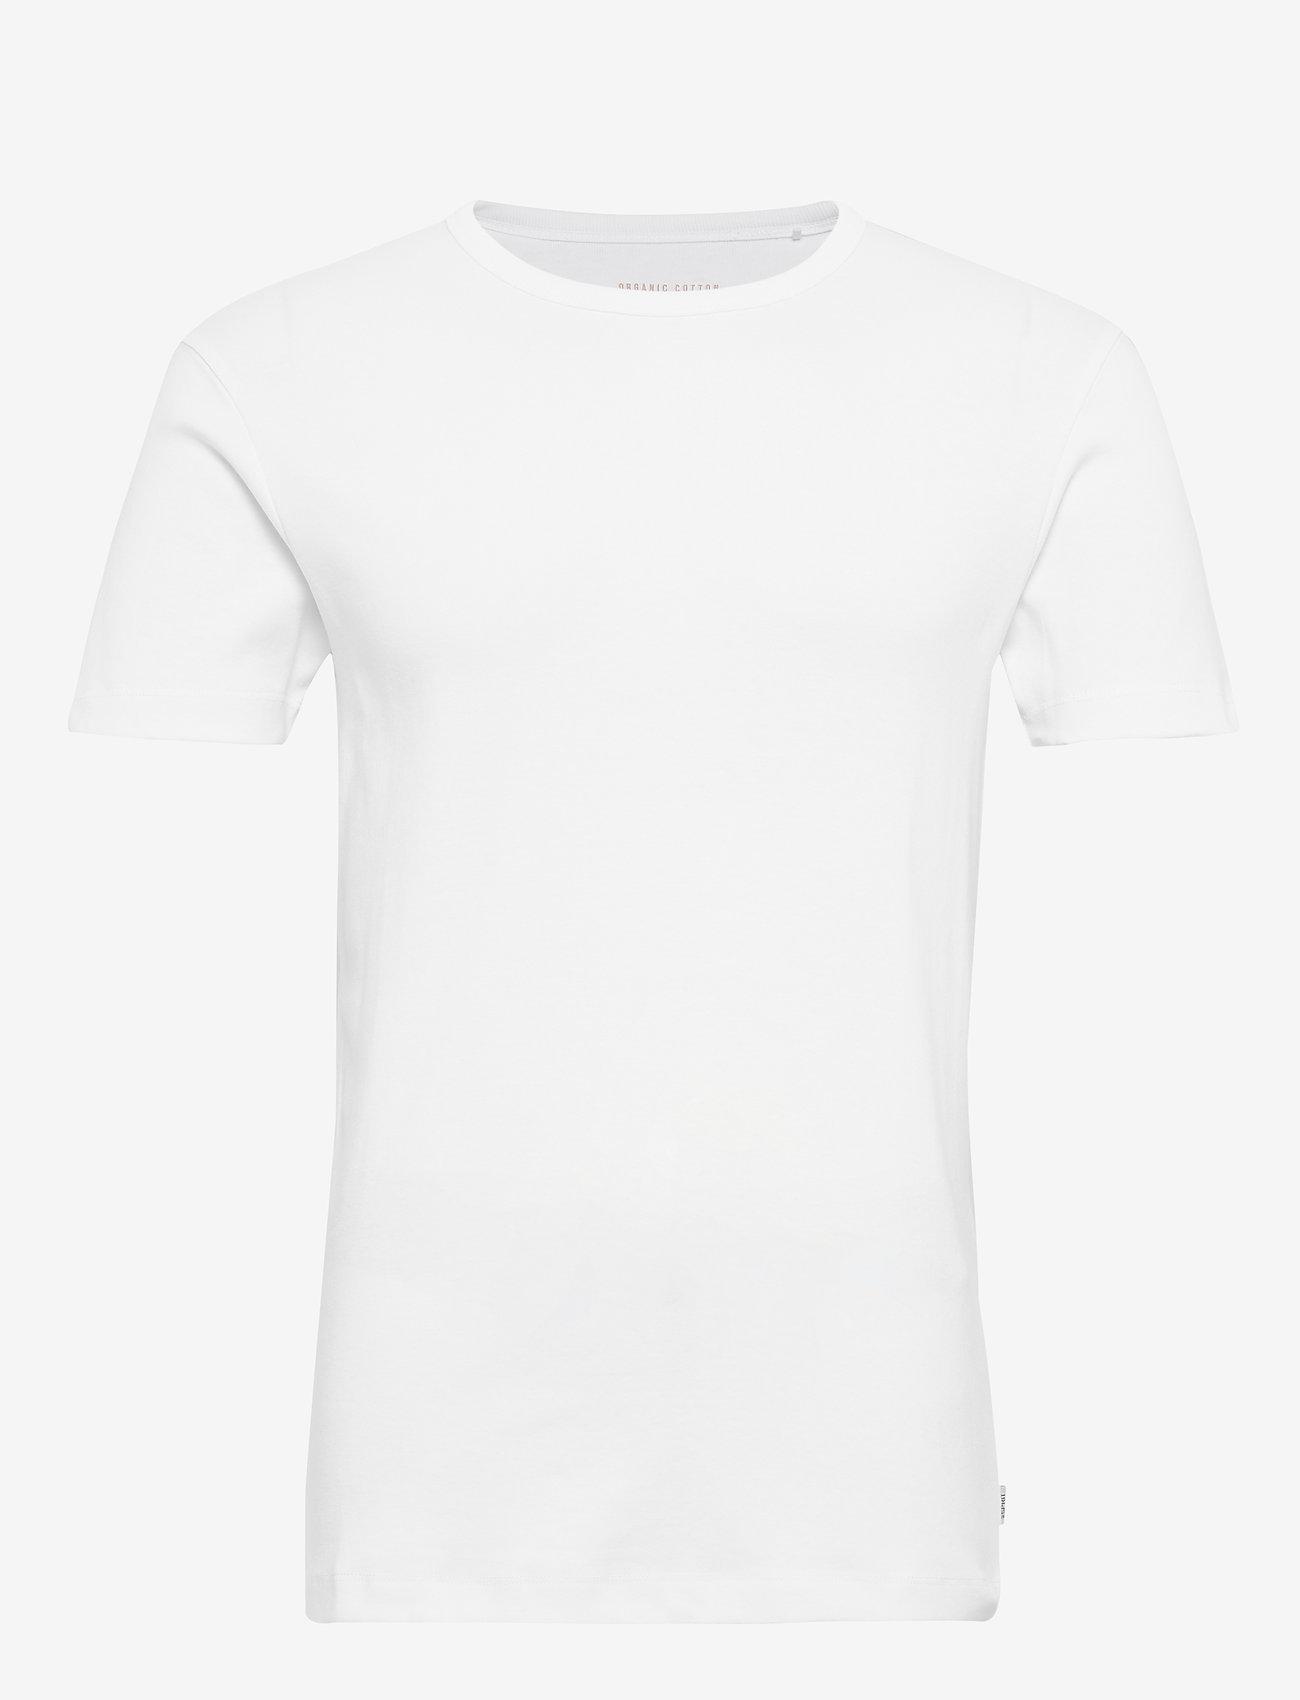 Esprit Casual - T-Shirts - basic t-shirts - white - 0